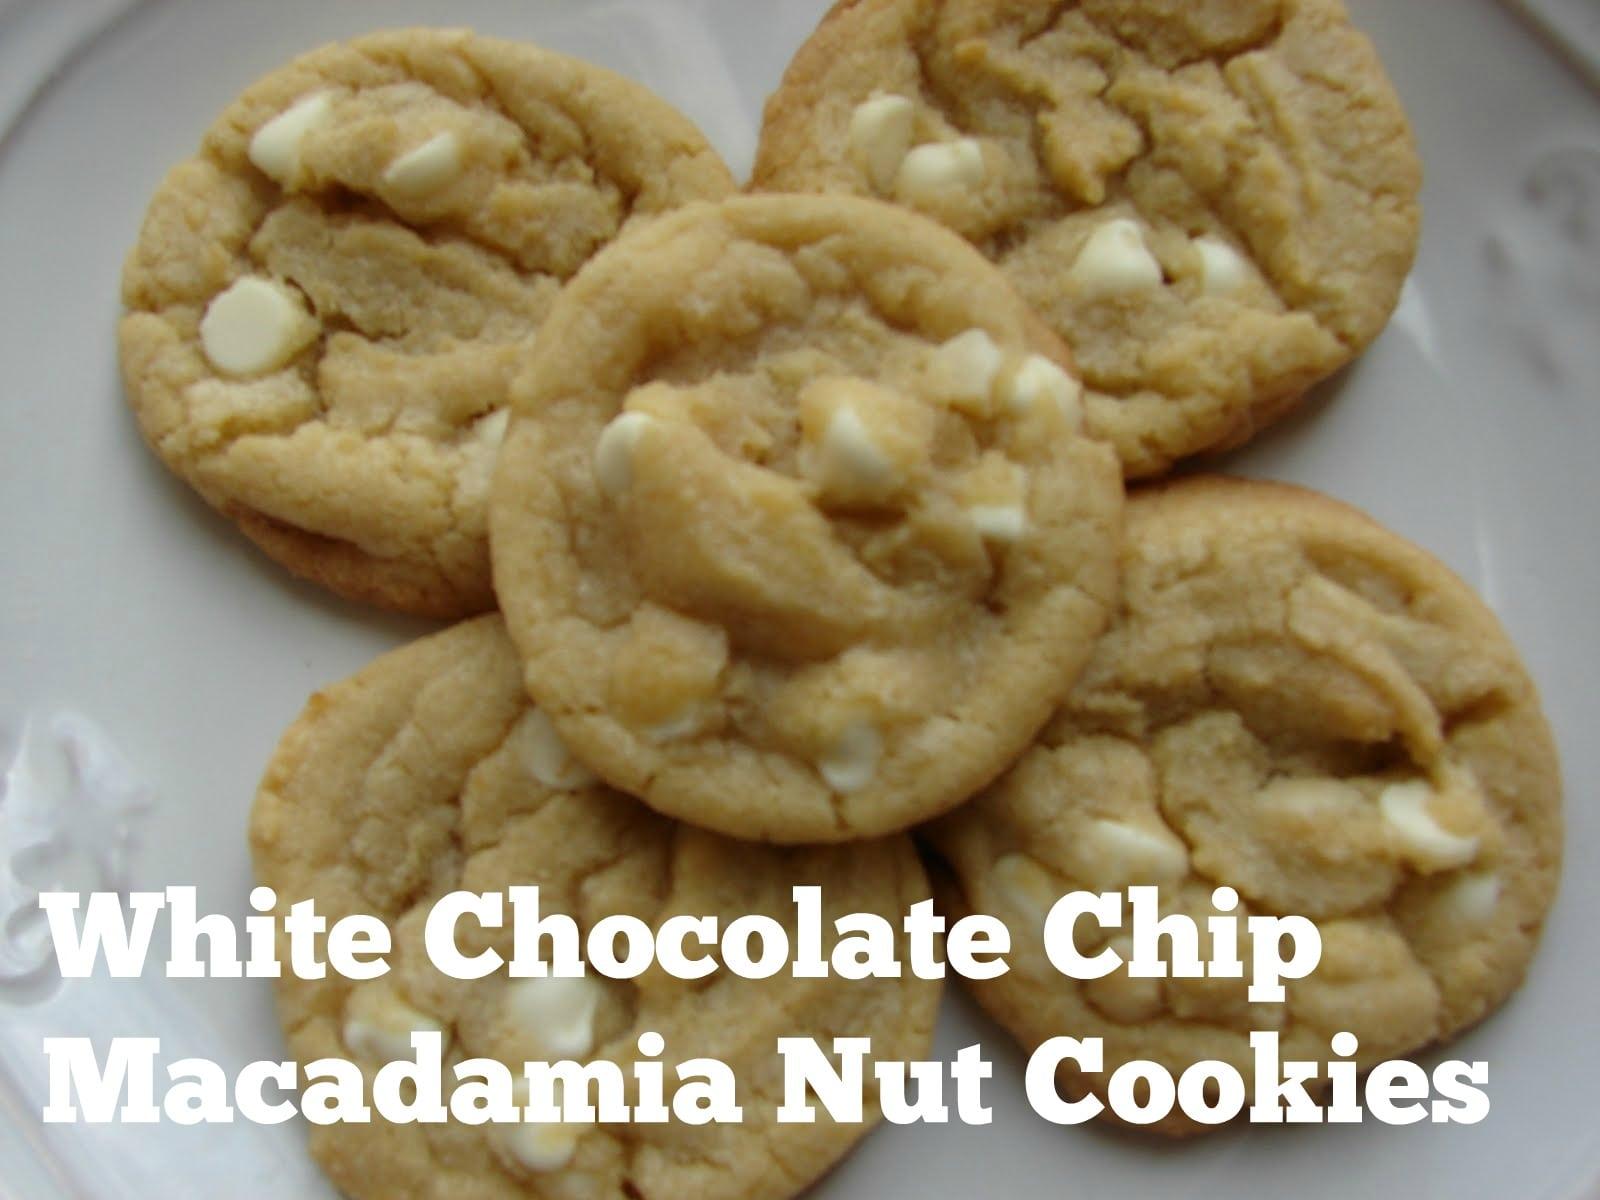 White Chip Macadamia Nut Cookies